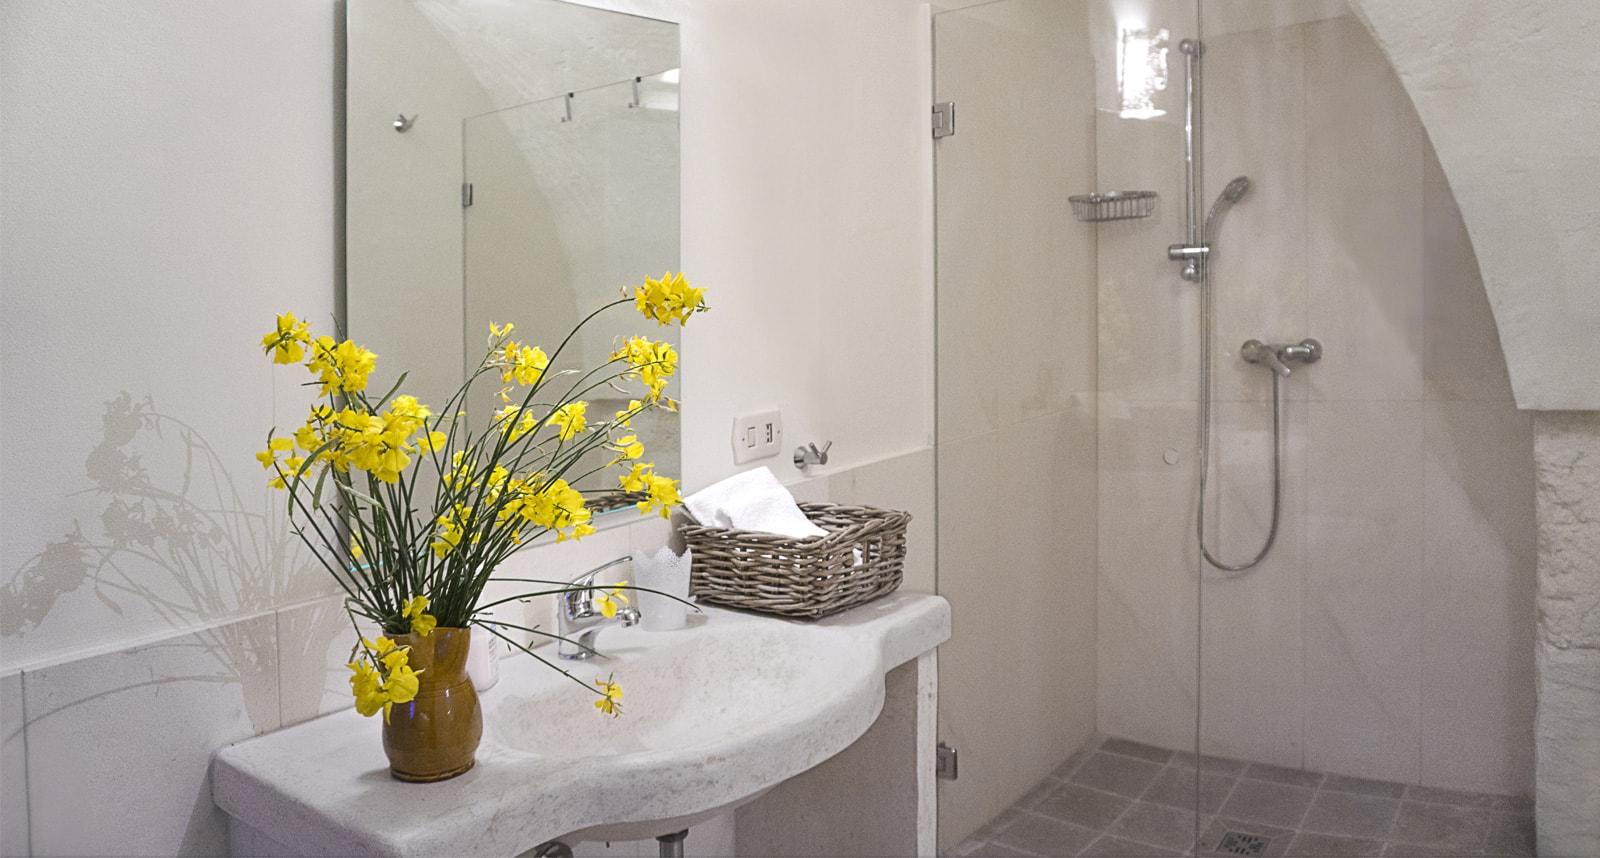 masseria-capece-toilet